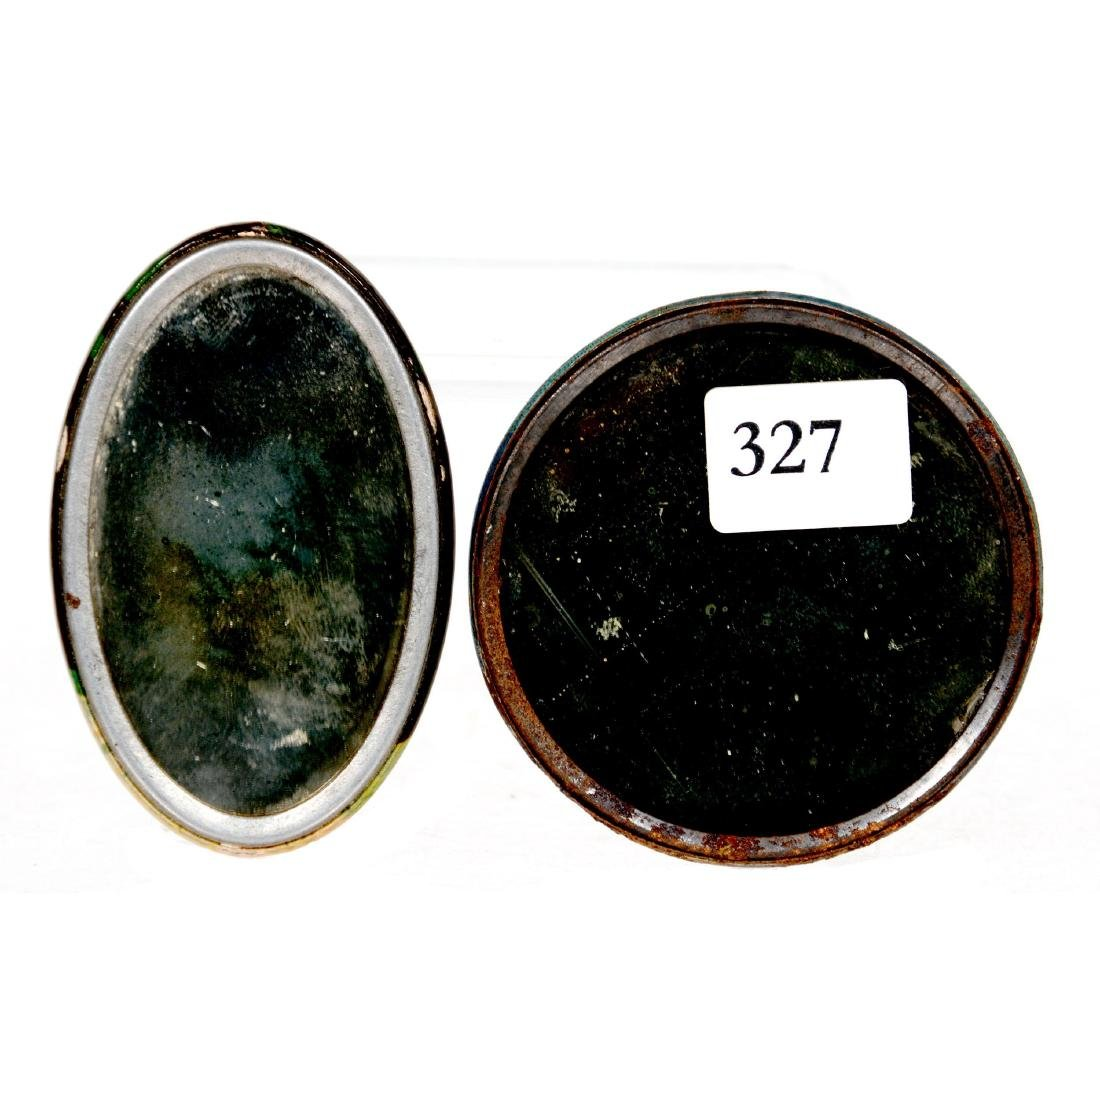 (2) Original Pocket Mirrors - 2